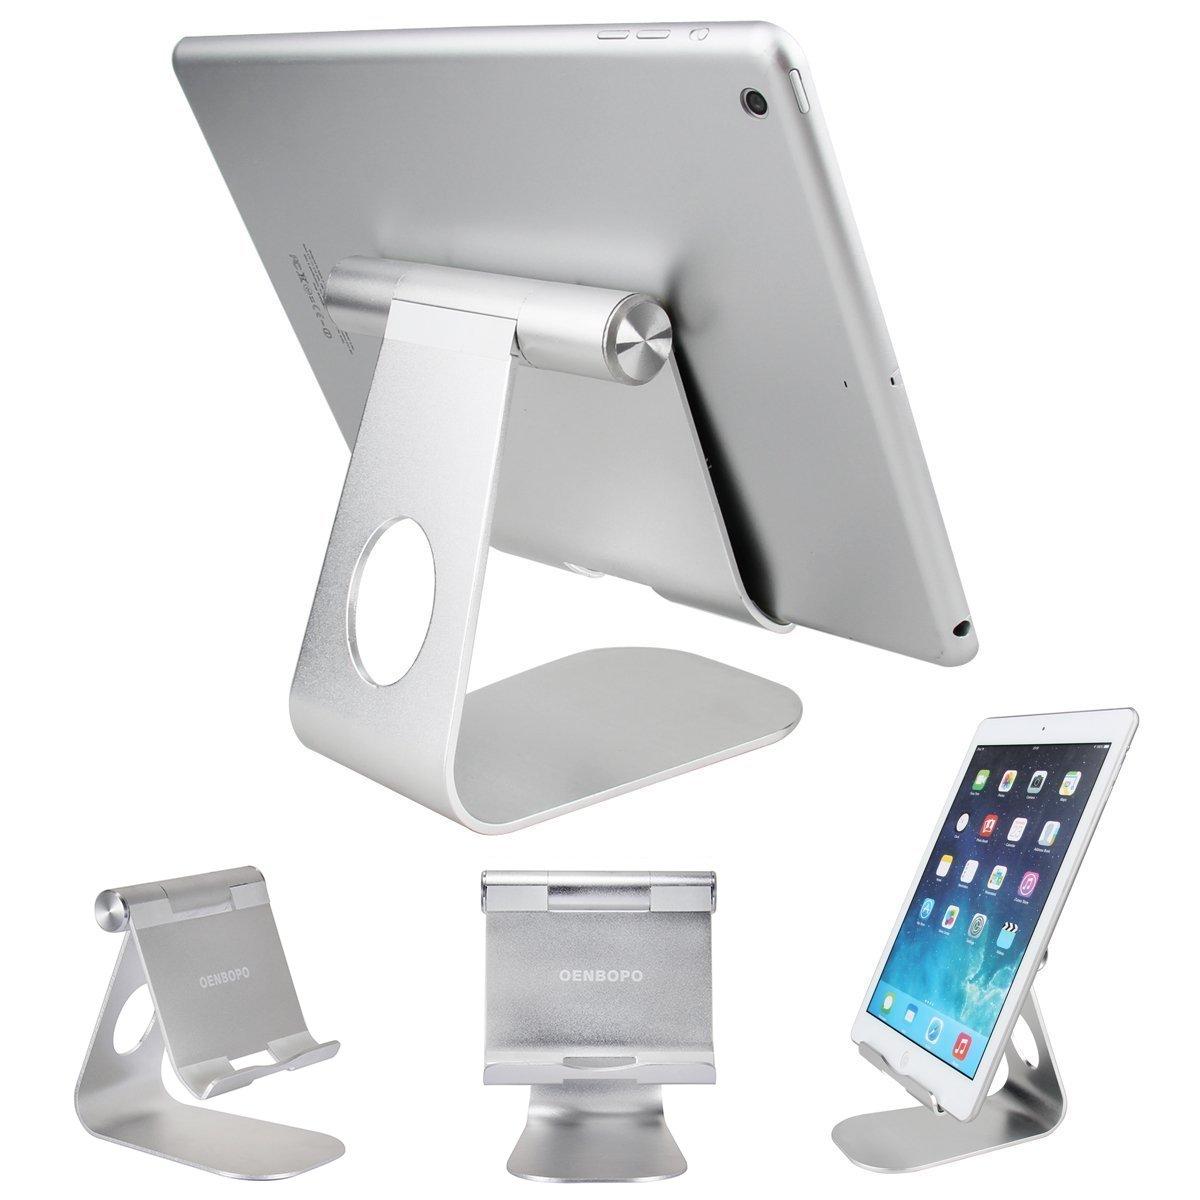 Tablet Stand Holder , Oenbopo iPad Stand 270° Rotatable Aluminum Desktop Tablet Holder Stand for iPad Pro iPad Mini iPad Air iPhone X/8/7/7Plus 6S Plus 5S 5C Samsung S6 S5 GPS